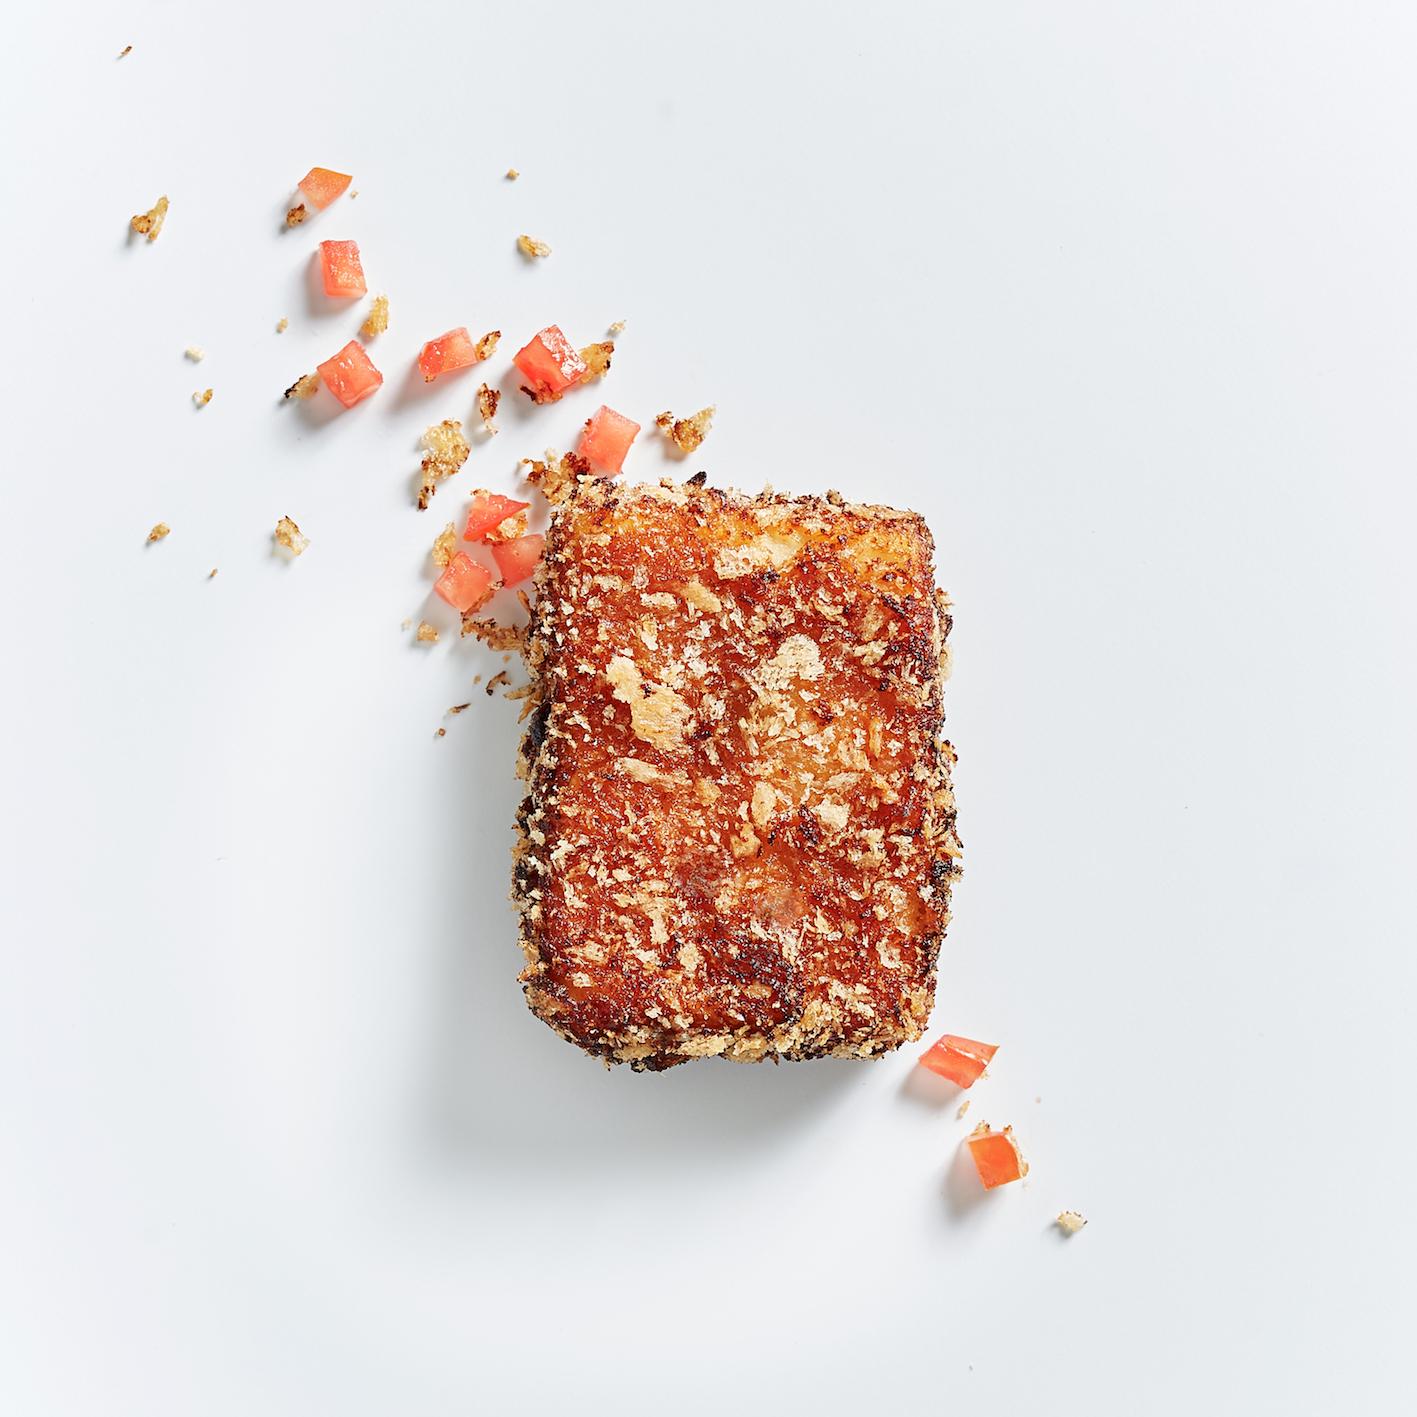 Sweet & Sour Tofu - (dairy free, nut free)tofu, garlic, ketchup, dijon mustard, soy sauce, brown sugar, chili flakes, panko flakes, plain flour